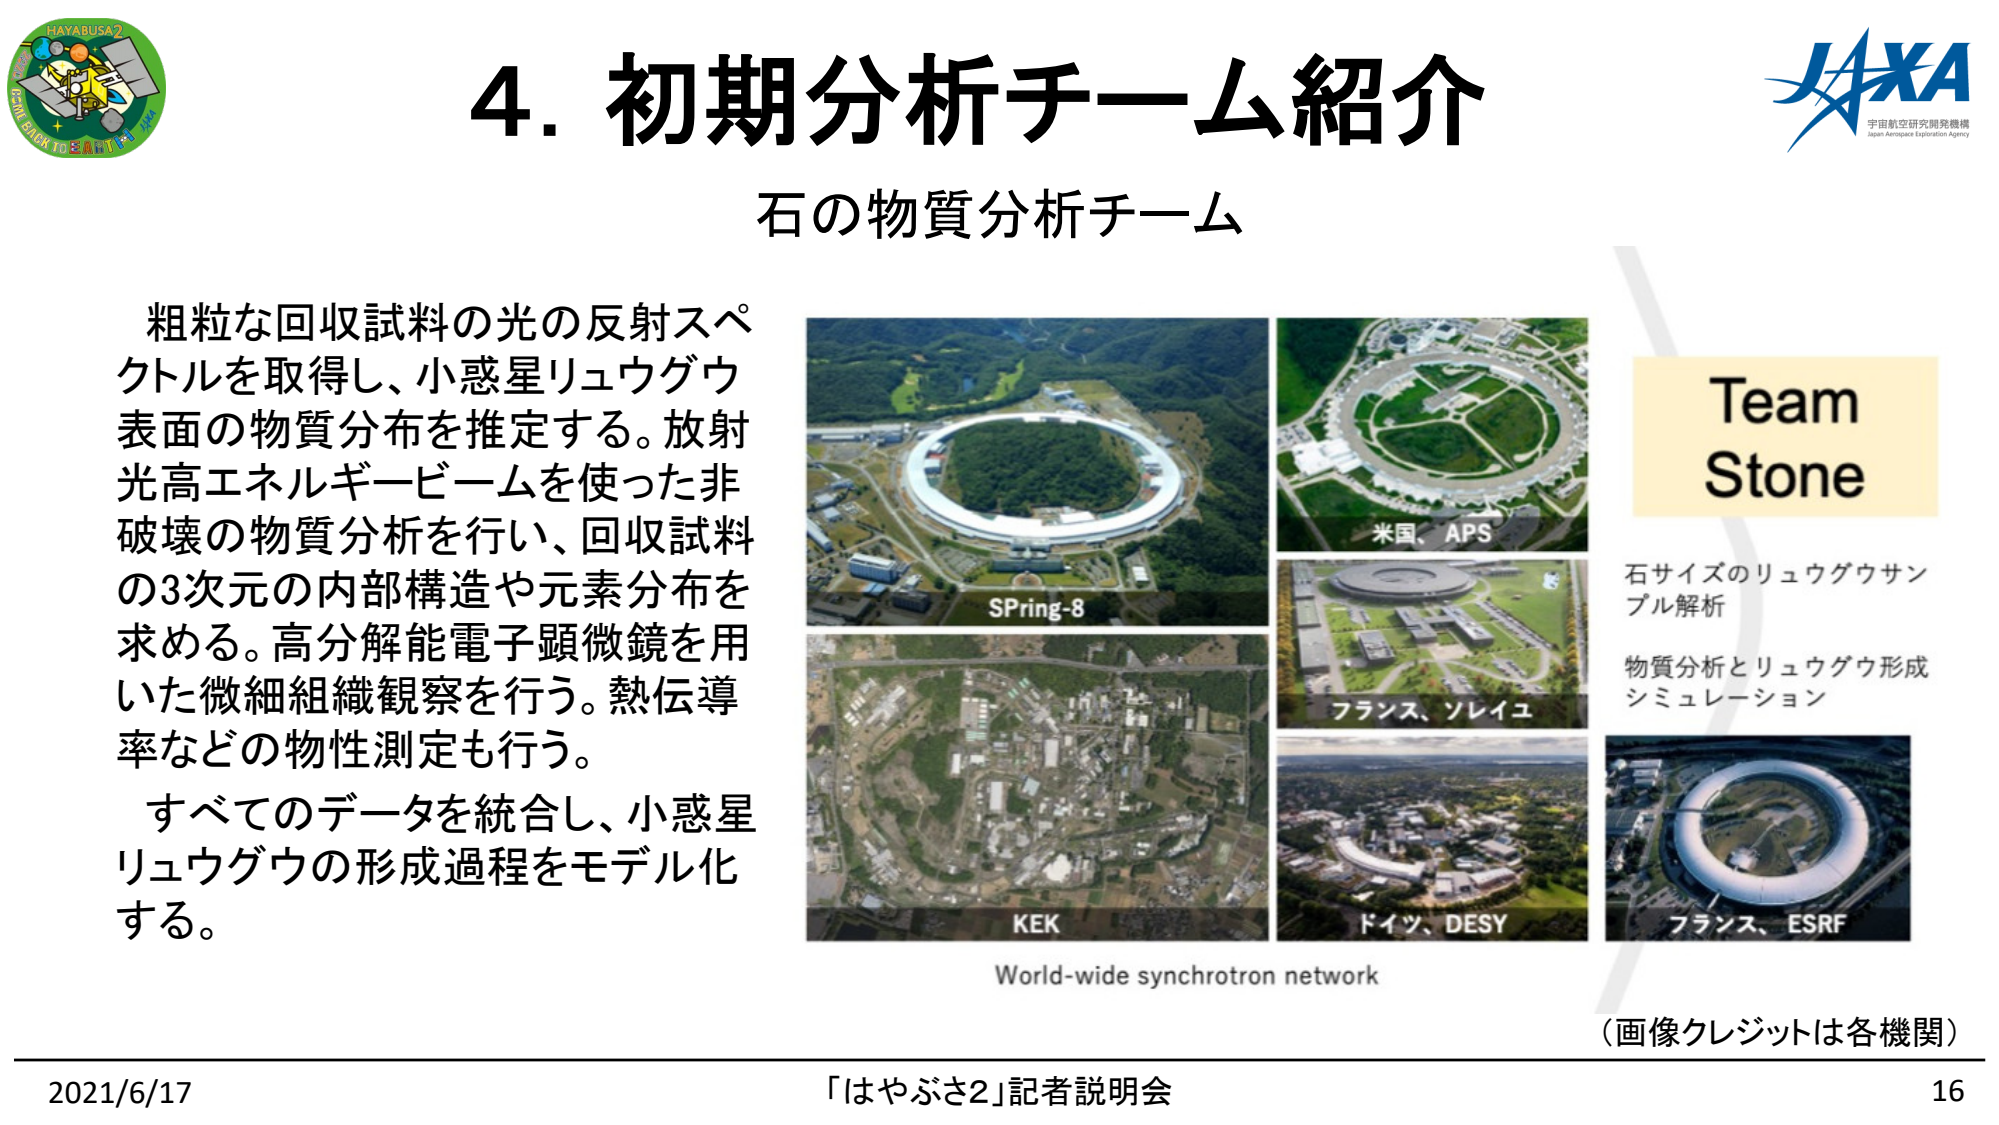 f:id:Imamura:20210617130256p:plain